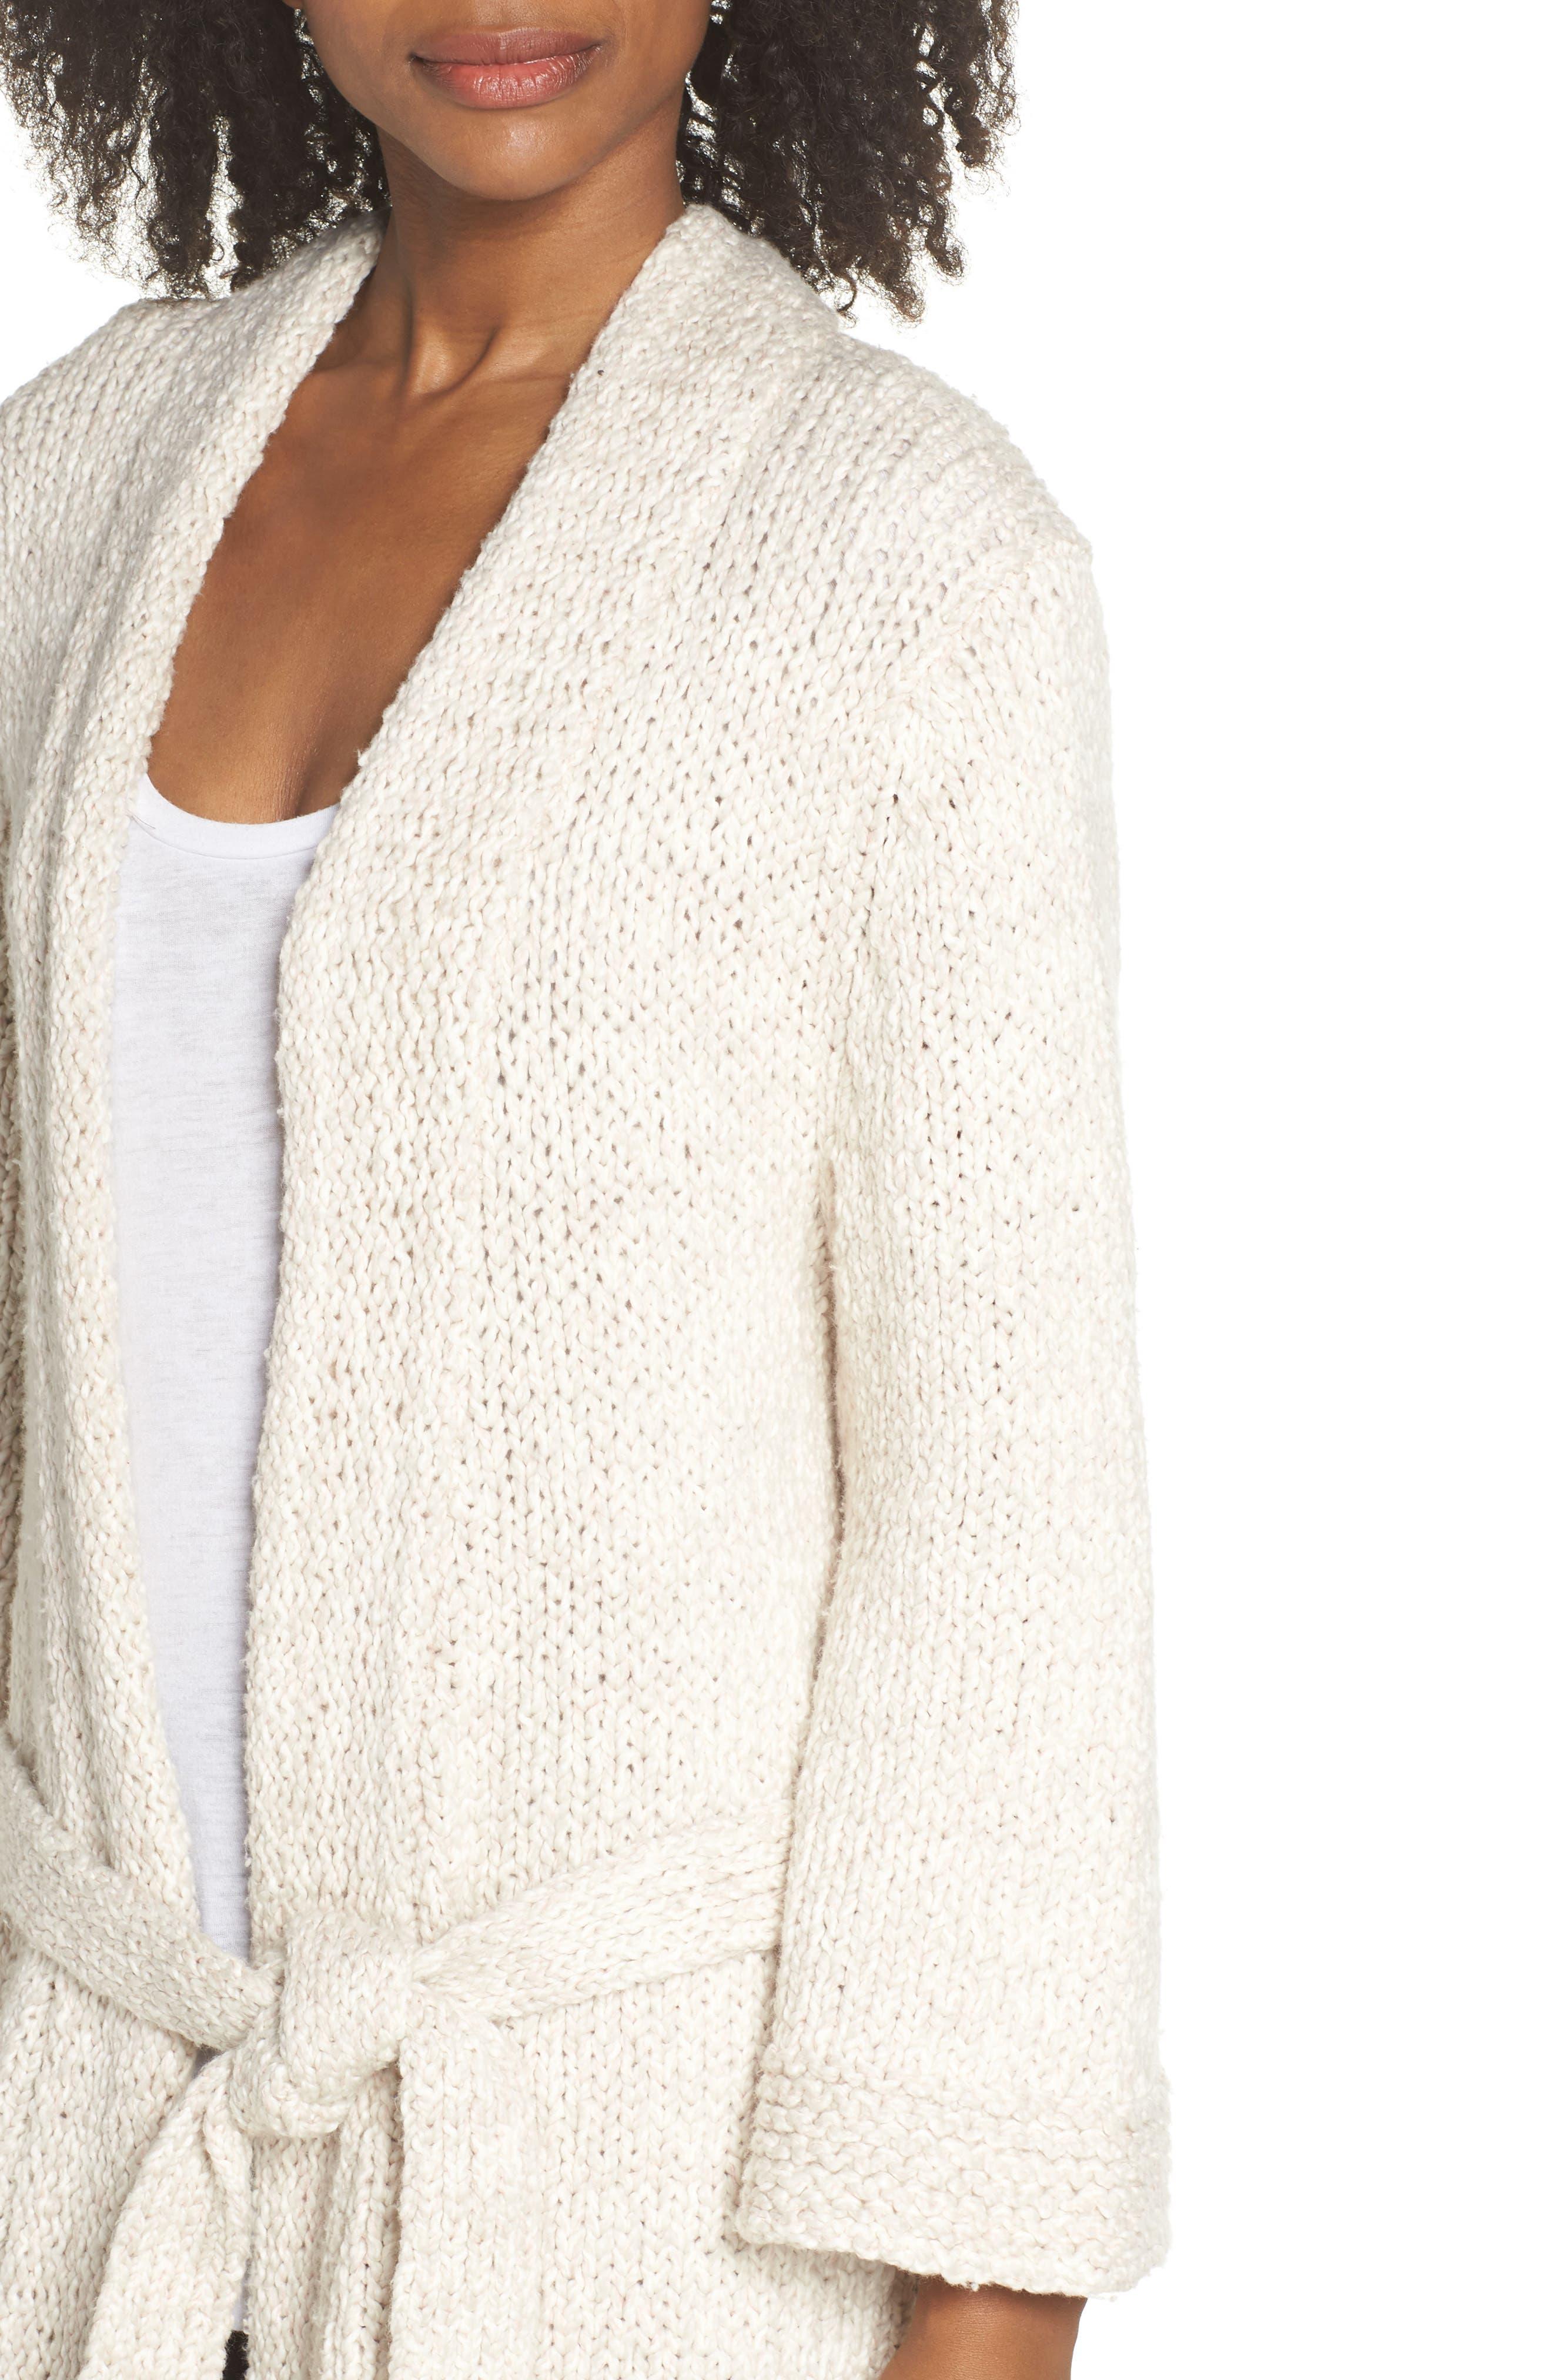 Kadia Organic Cotton Wrap,                             Alternate thumbnail 4, color,                             900